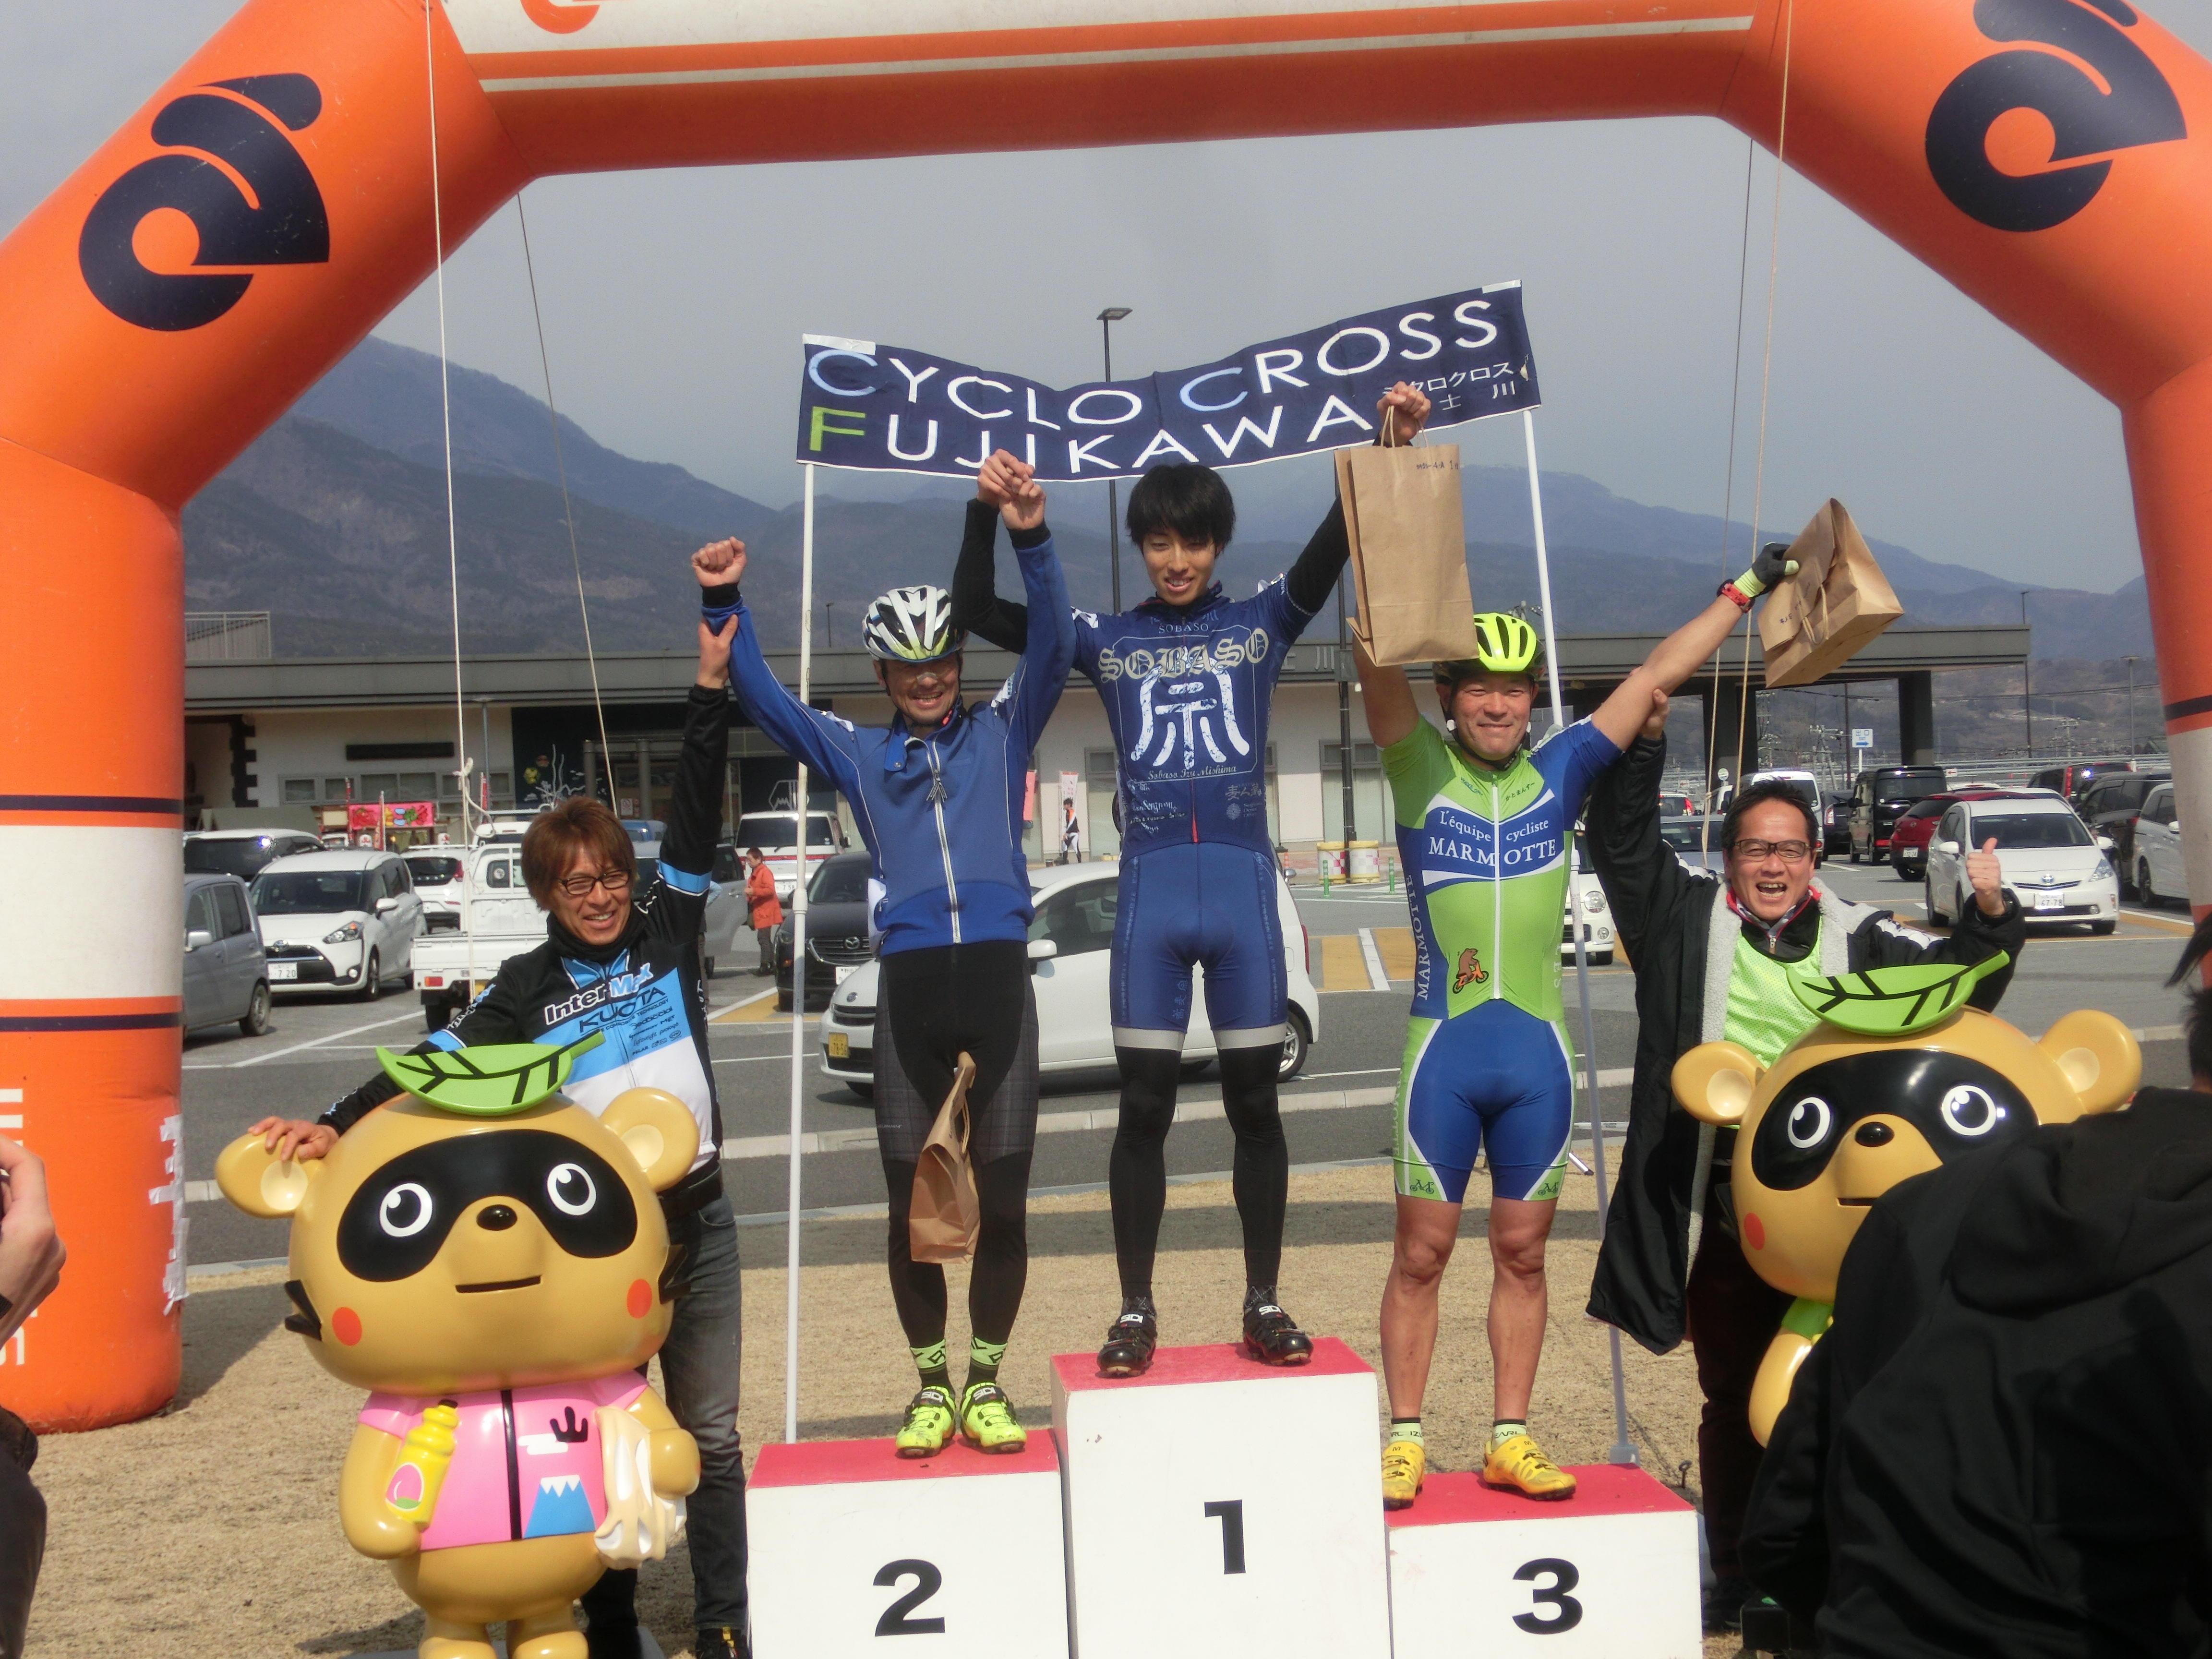 https://www.cyclocross.jp/news/1903170079.JPG